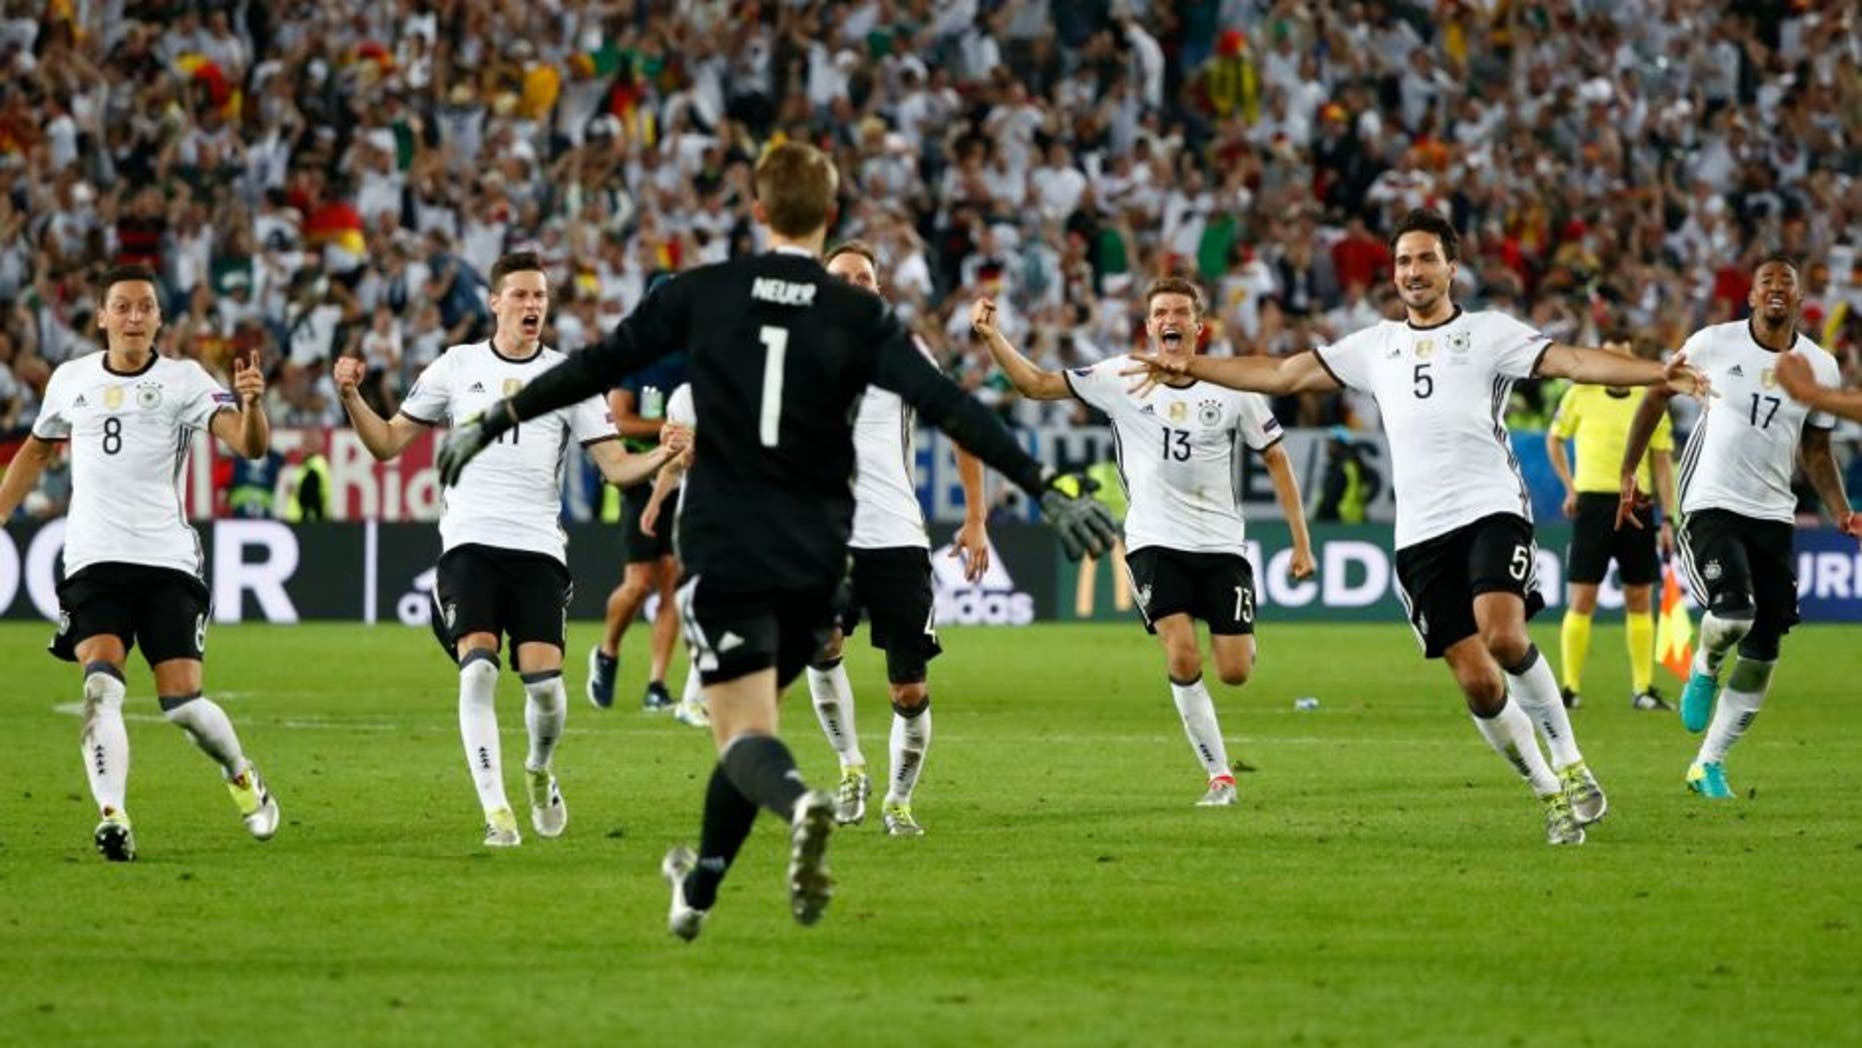 Football Soccer - Germany v Italy - EURO 2016 - Quarter Final - Stade de Bordeaux, Bordeaux, France - 2/7/16 Germany players celebrate winning the penalty shootout REUTERS/Christian Hartmann Livepic